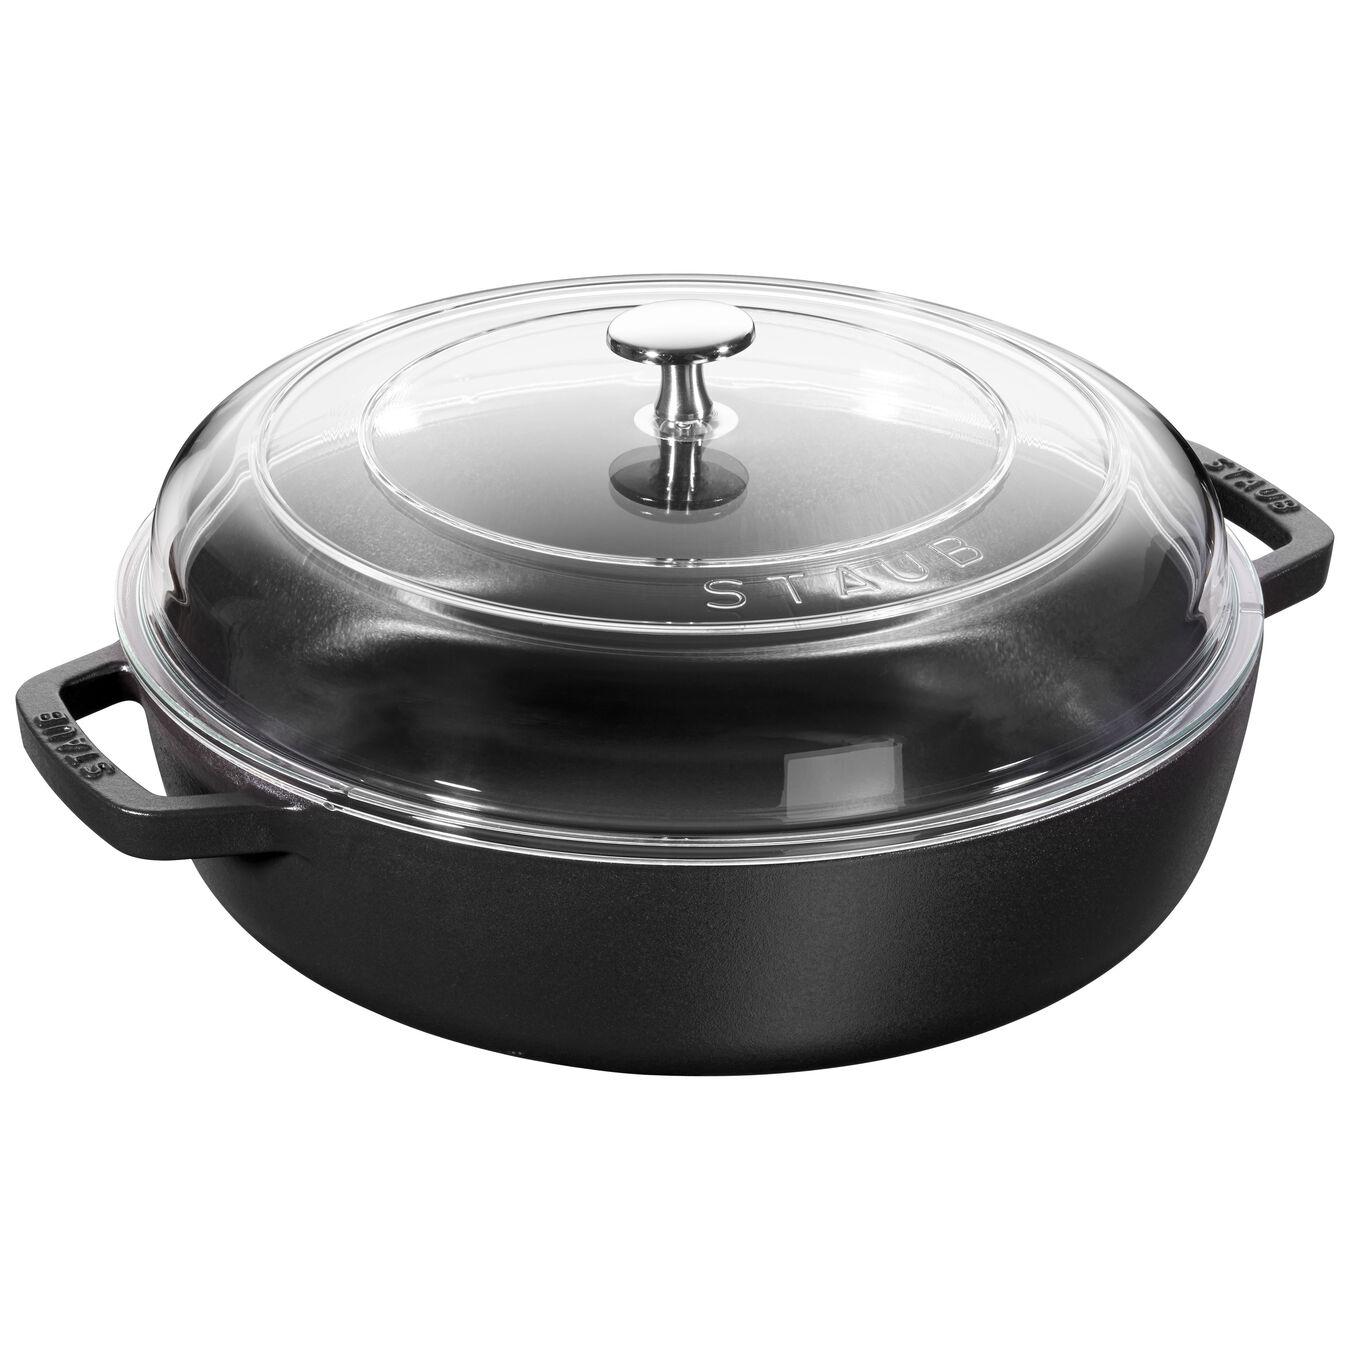 3.75 l Cast iron round Saute pan with glass lid, black,,large 1